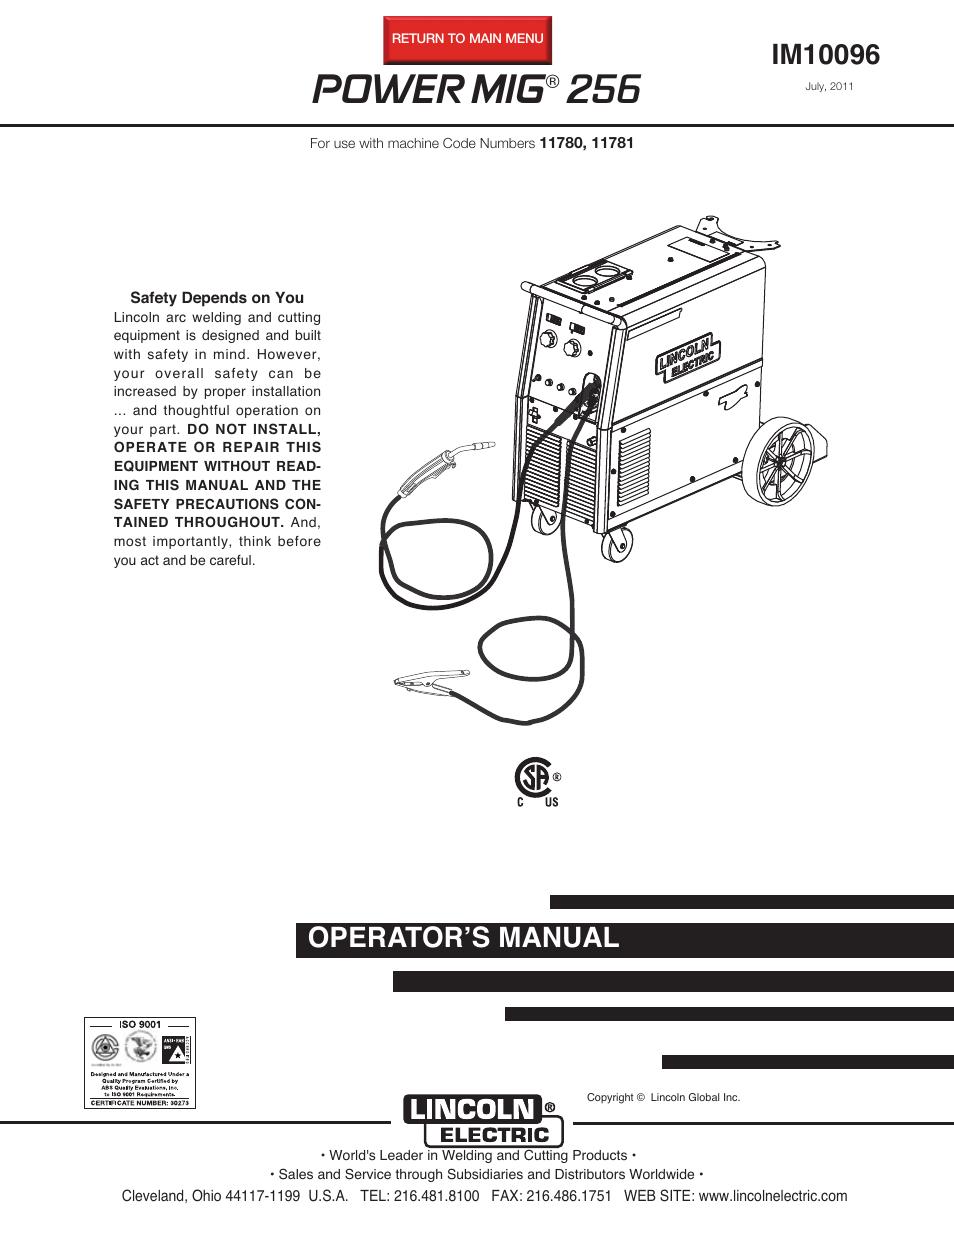 lincoln electric im10096 power mig 256 page1 install mig welder wiring www toyskids co \u2022